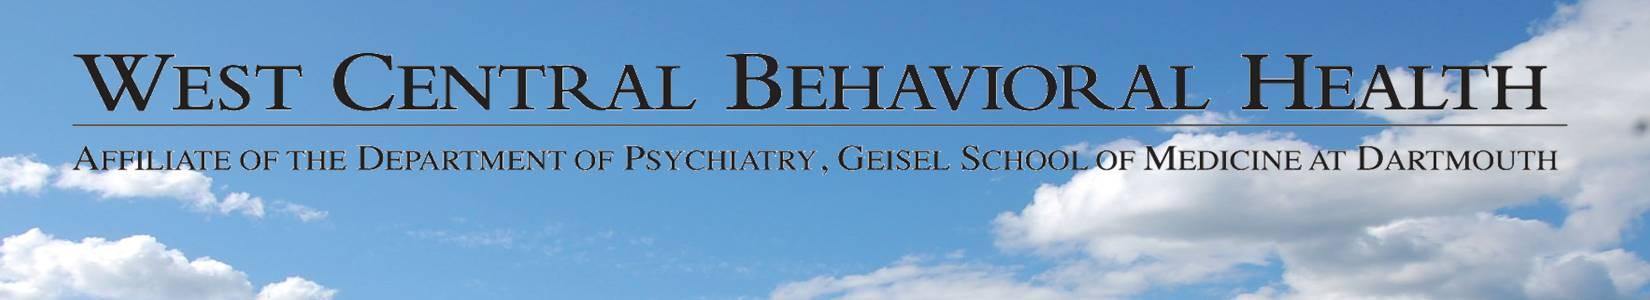 West Central Behavioral Health